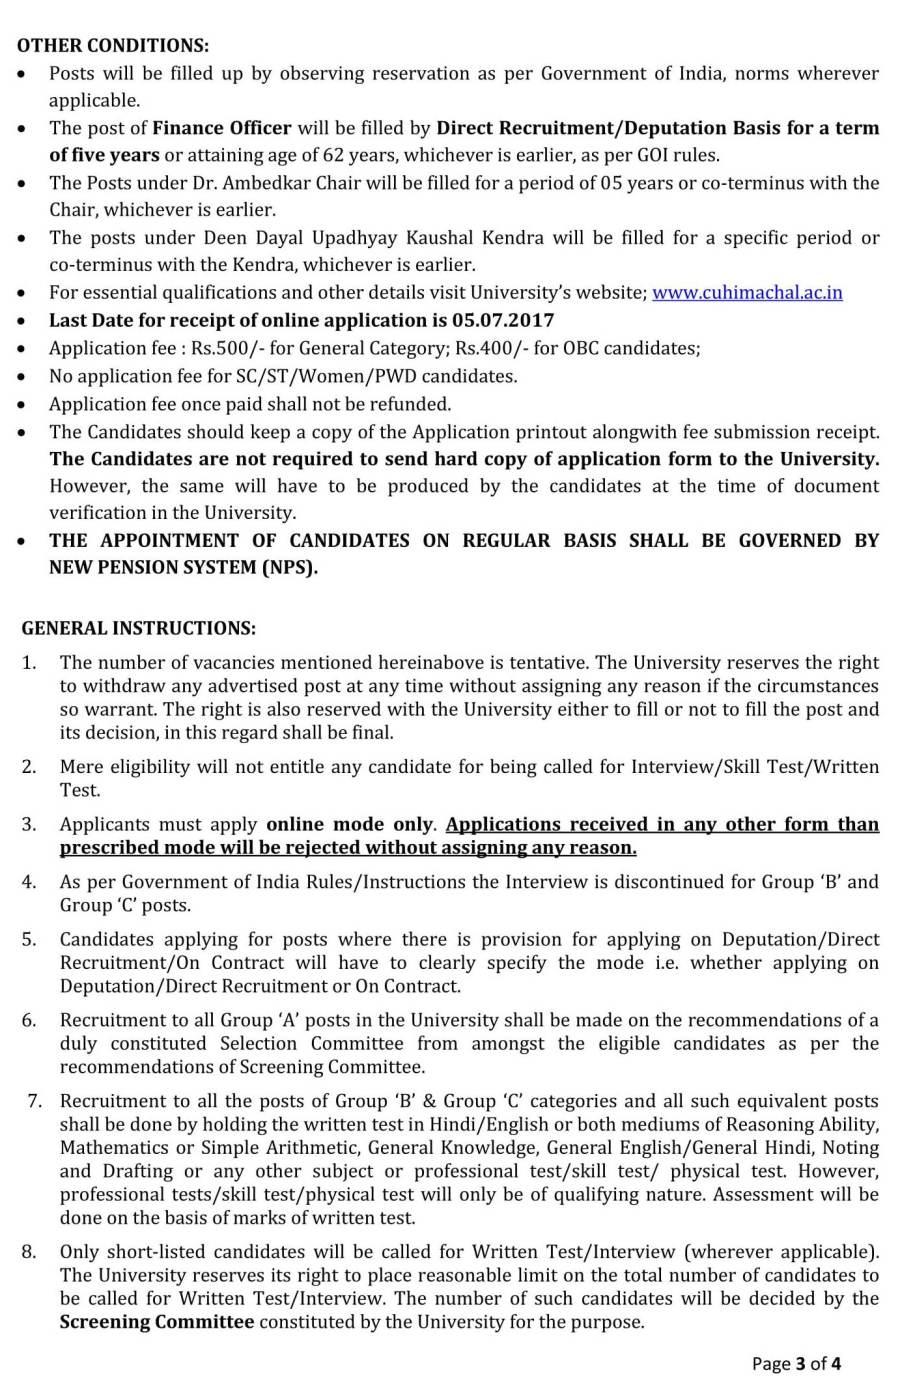 Emp. Notice 01-2017_Non-Teaching Positions Advertisement_Final (English)_27.05.2017-3.jpg